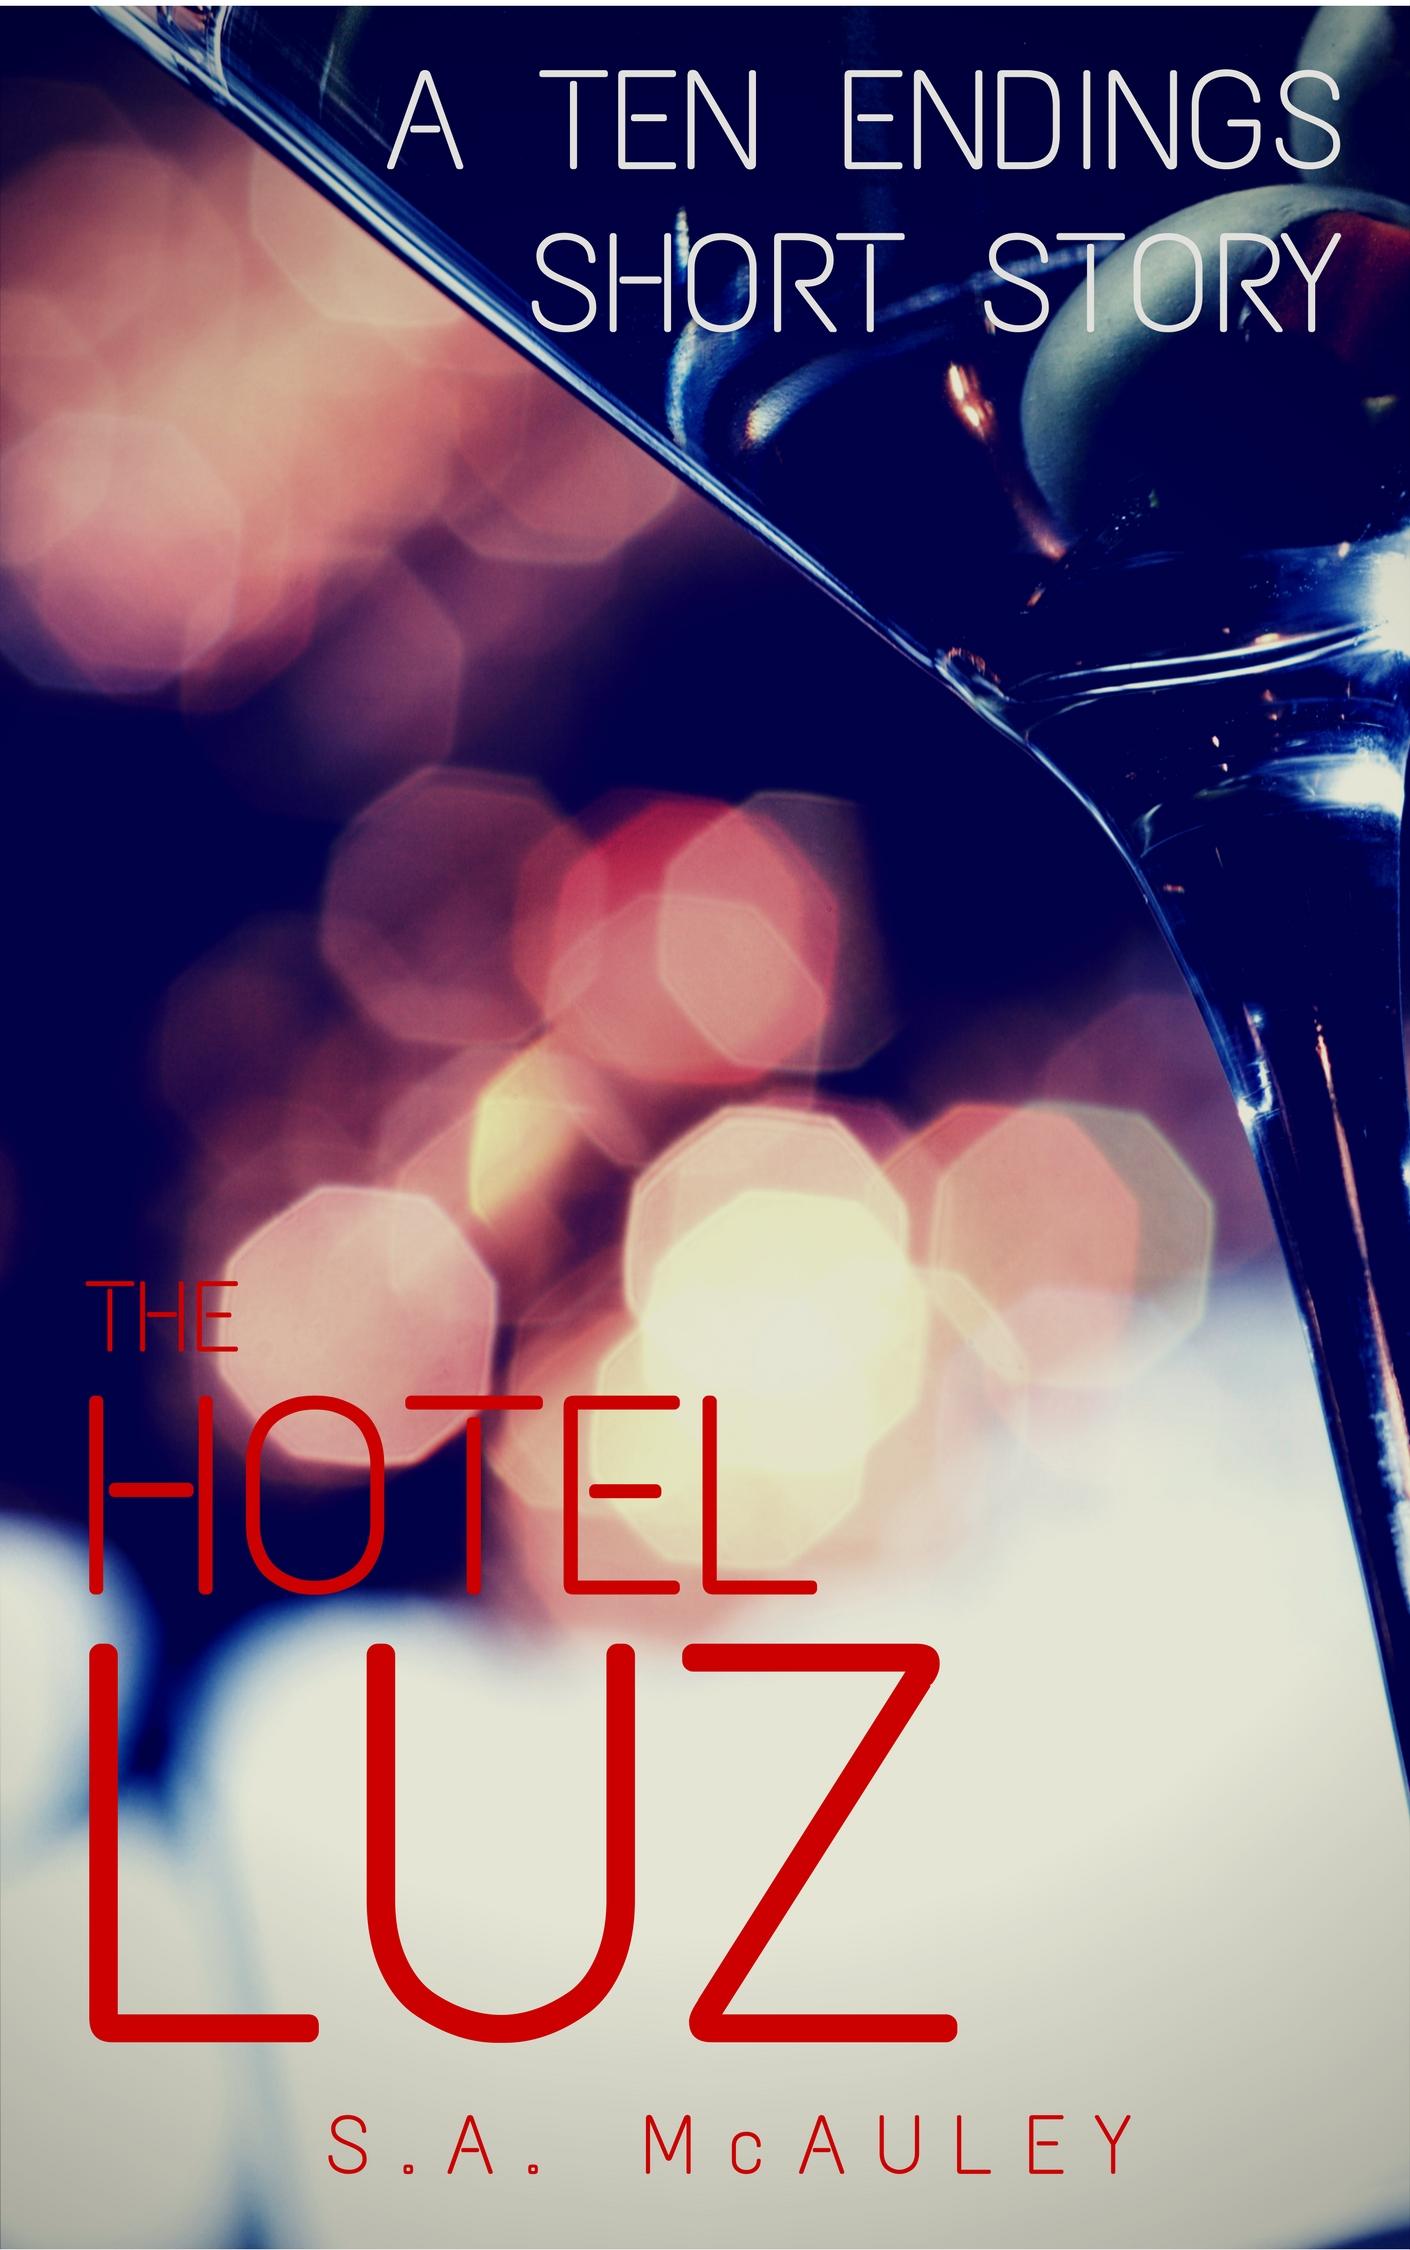 The Hotel Luz.jpg